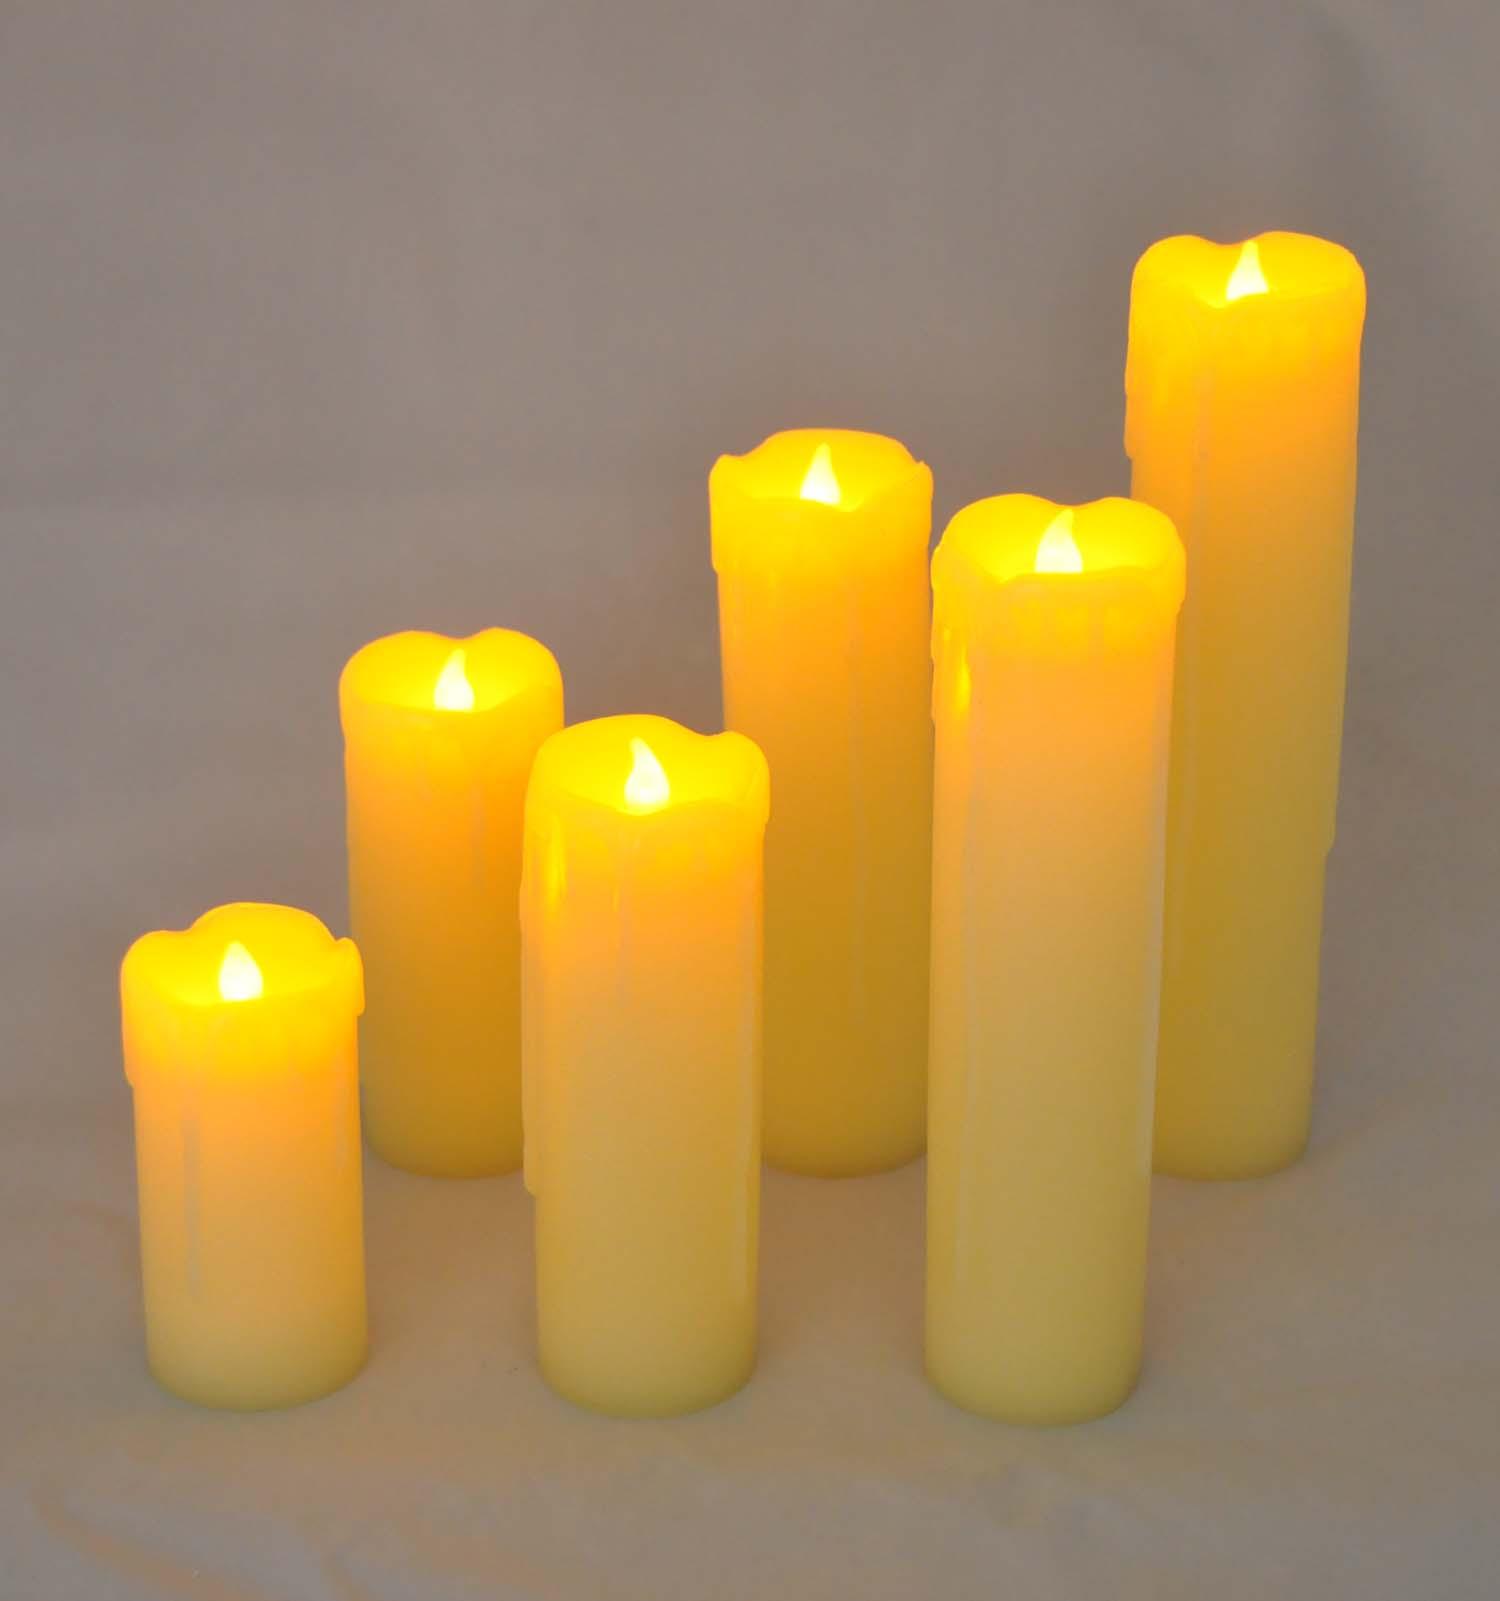 951003-Echtwachs-LED-Kerzen.jpg